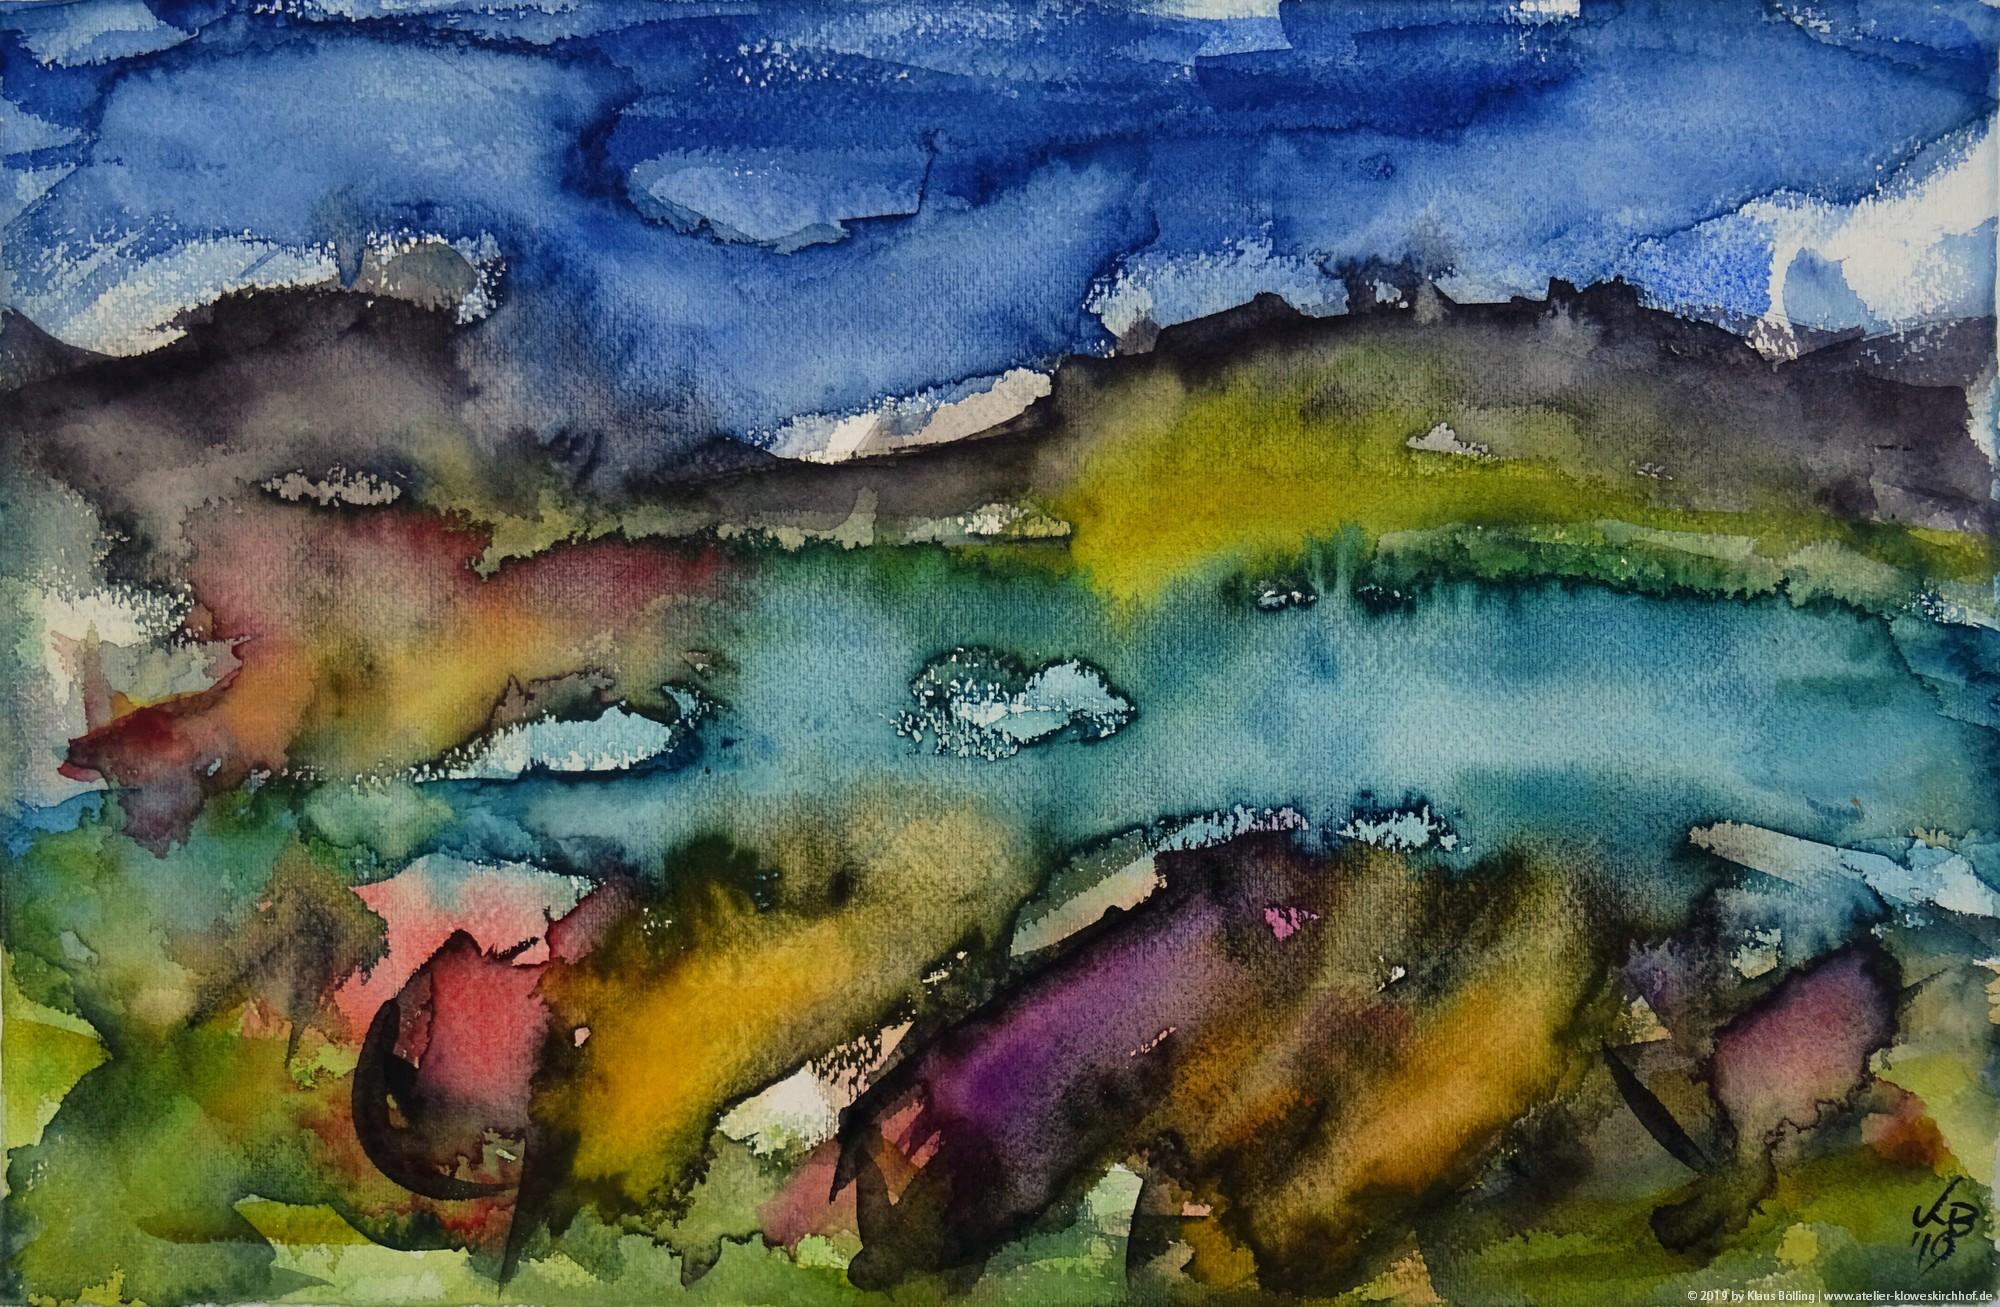 Badentarbet Bay, Coigach, Watercolour 50 x 32,5 cm, © 2019 by Klaus Bölling